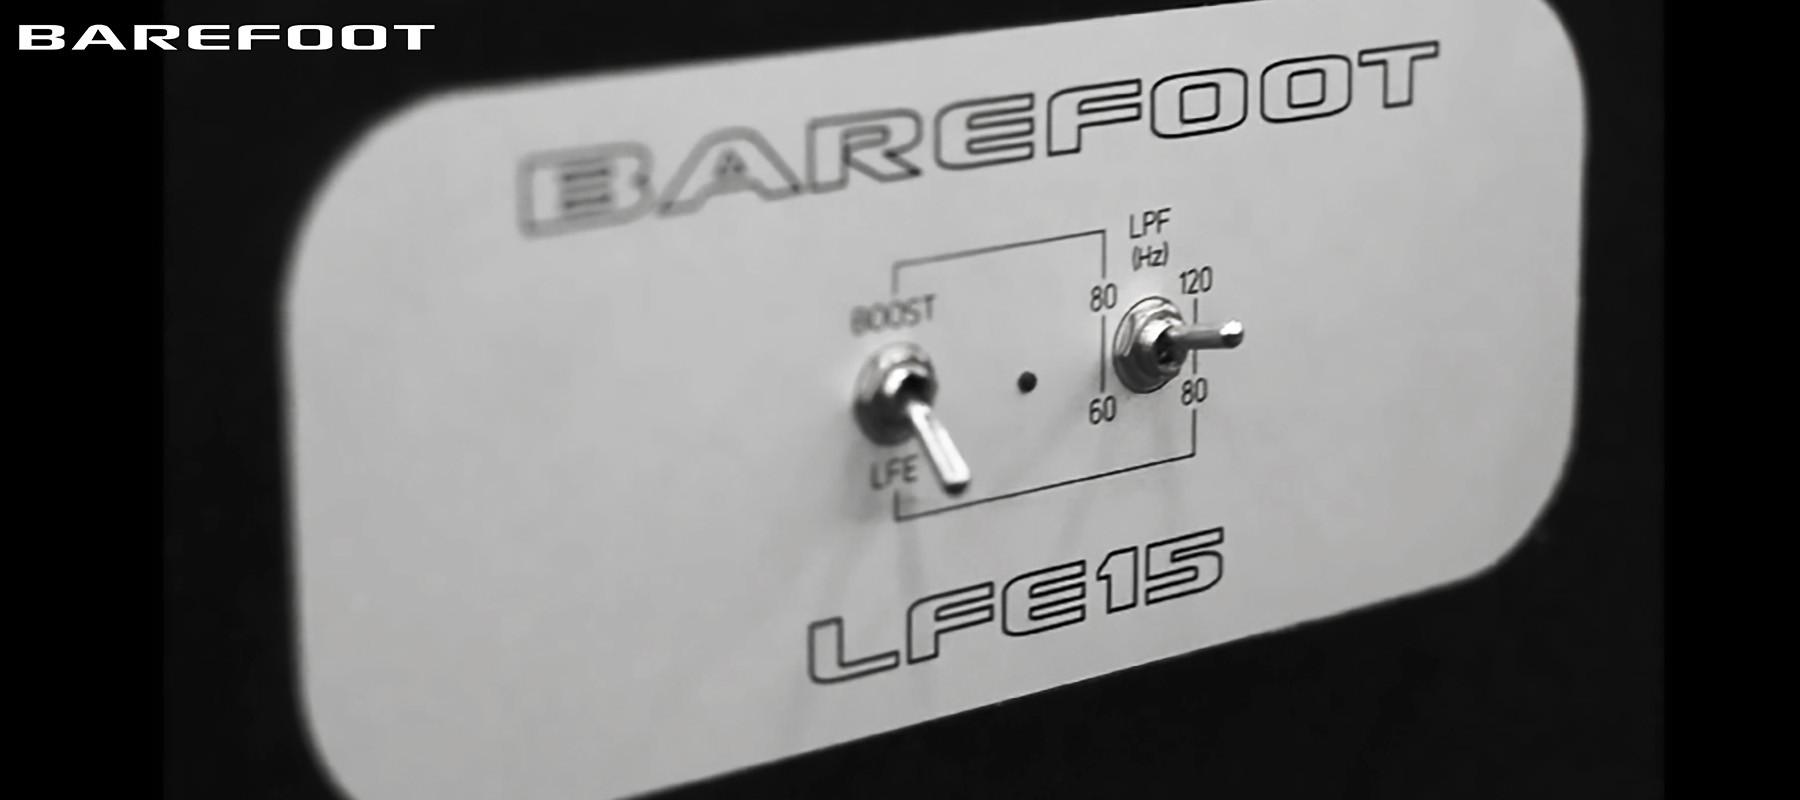 Barefoot LFE15